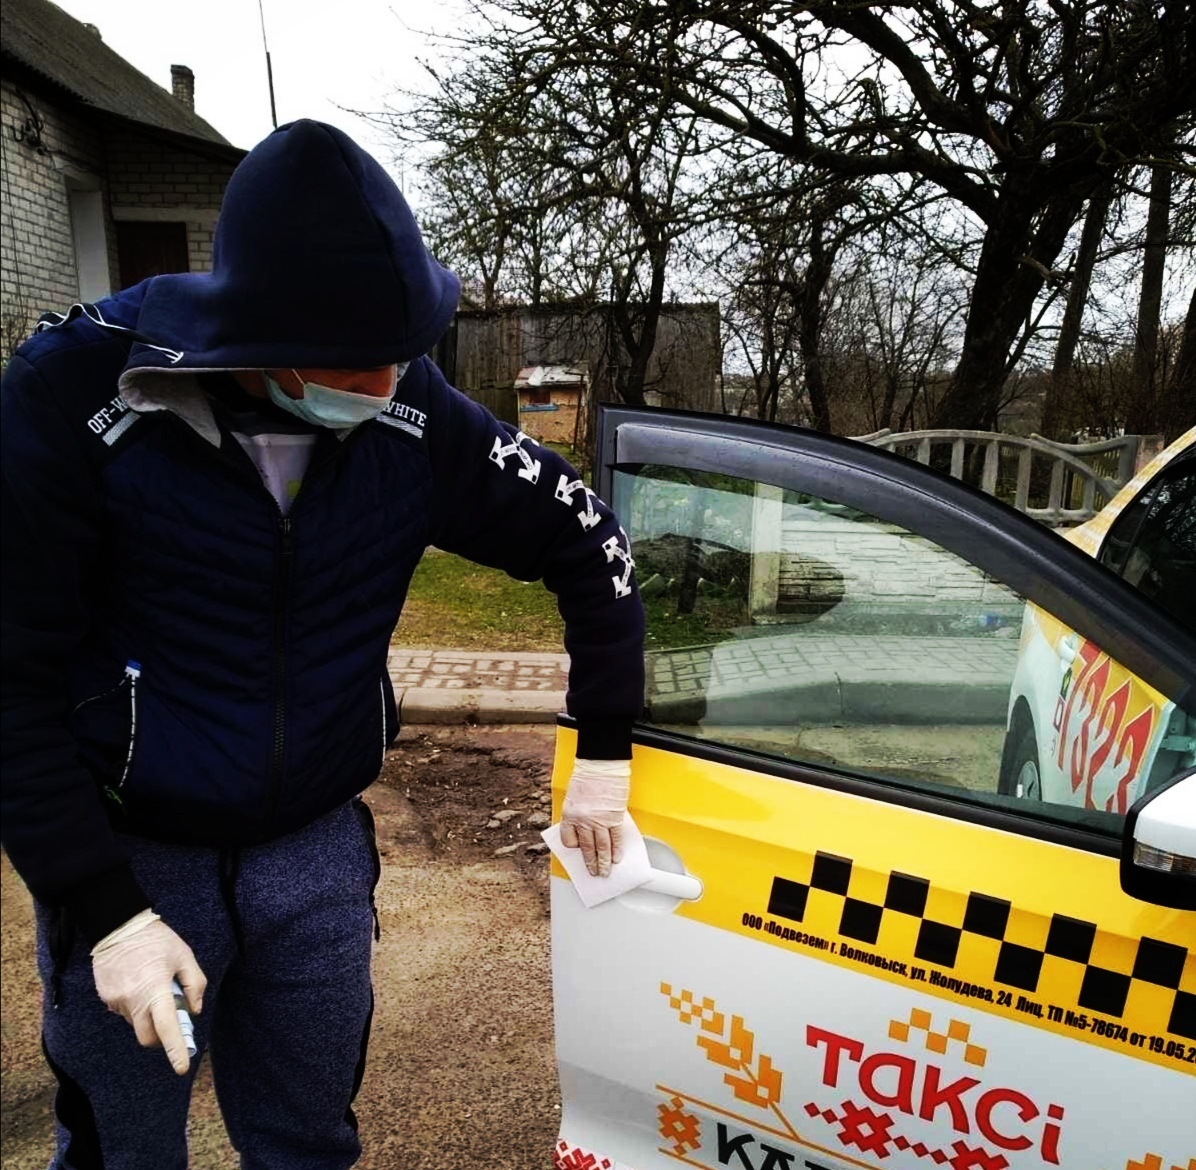 Дезинфекция в службе такси